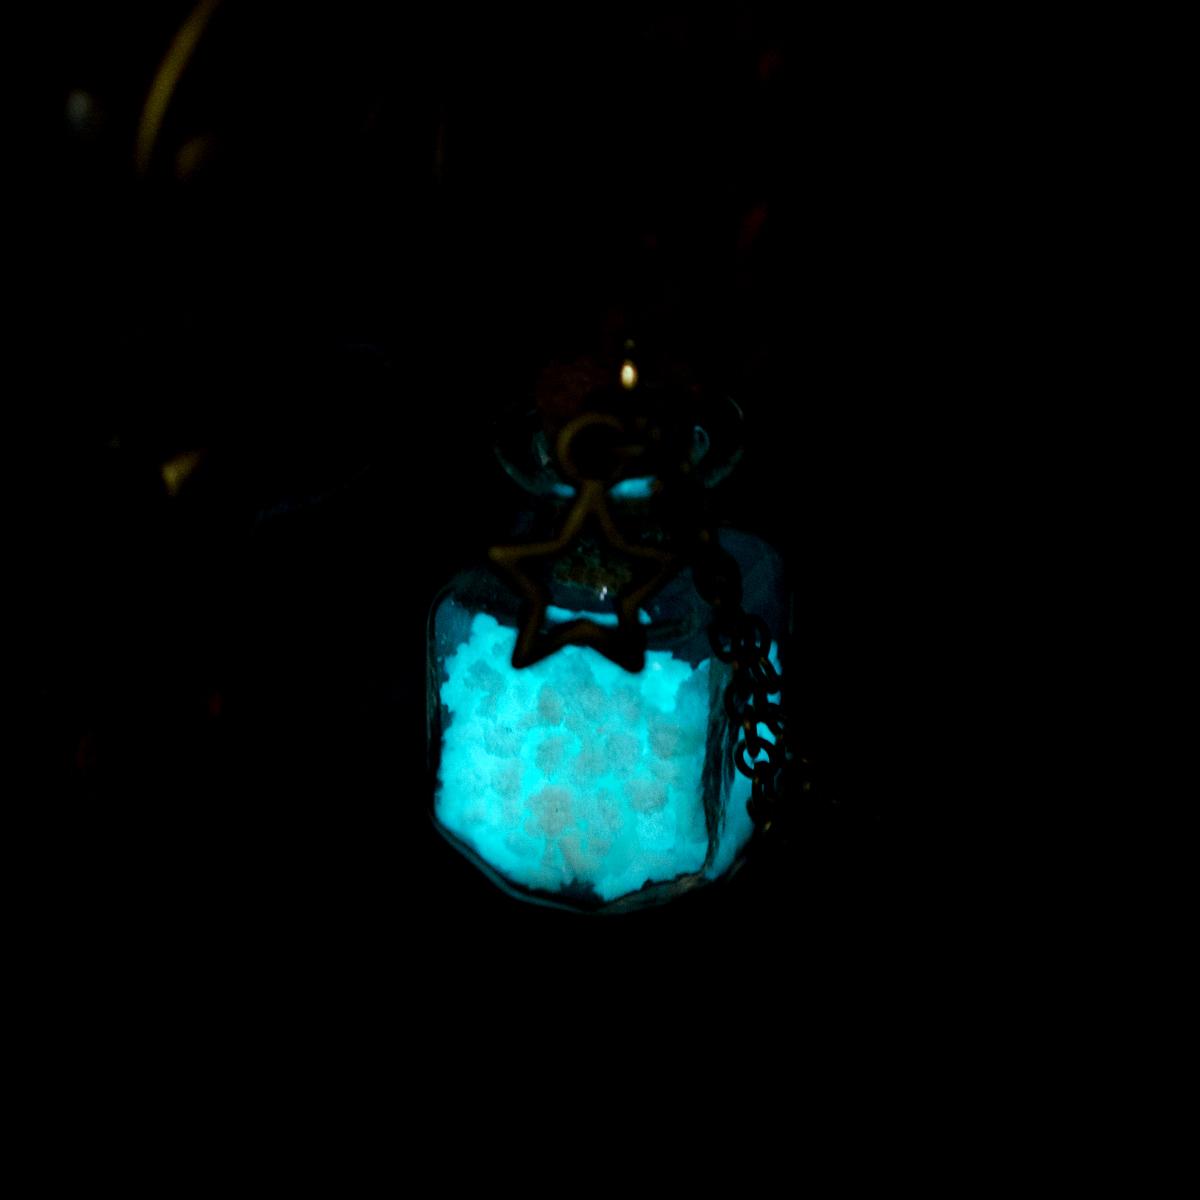 Steampunk Glow In the Dark Necklace Luminous Stone Locket Wishing Bottle Pendant Choker Mermaid Necklace Collares Choker Jewelry